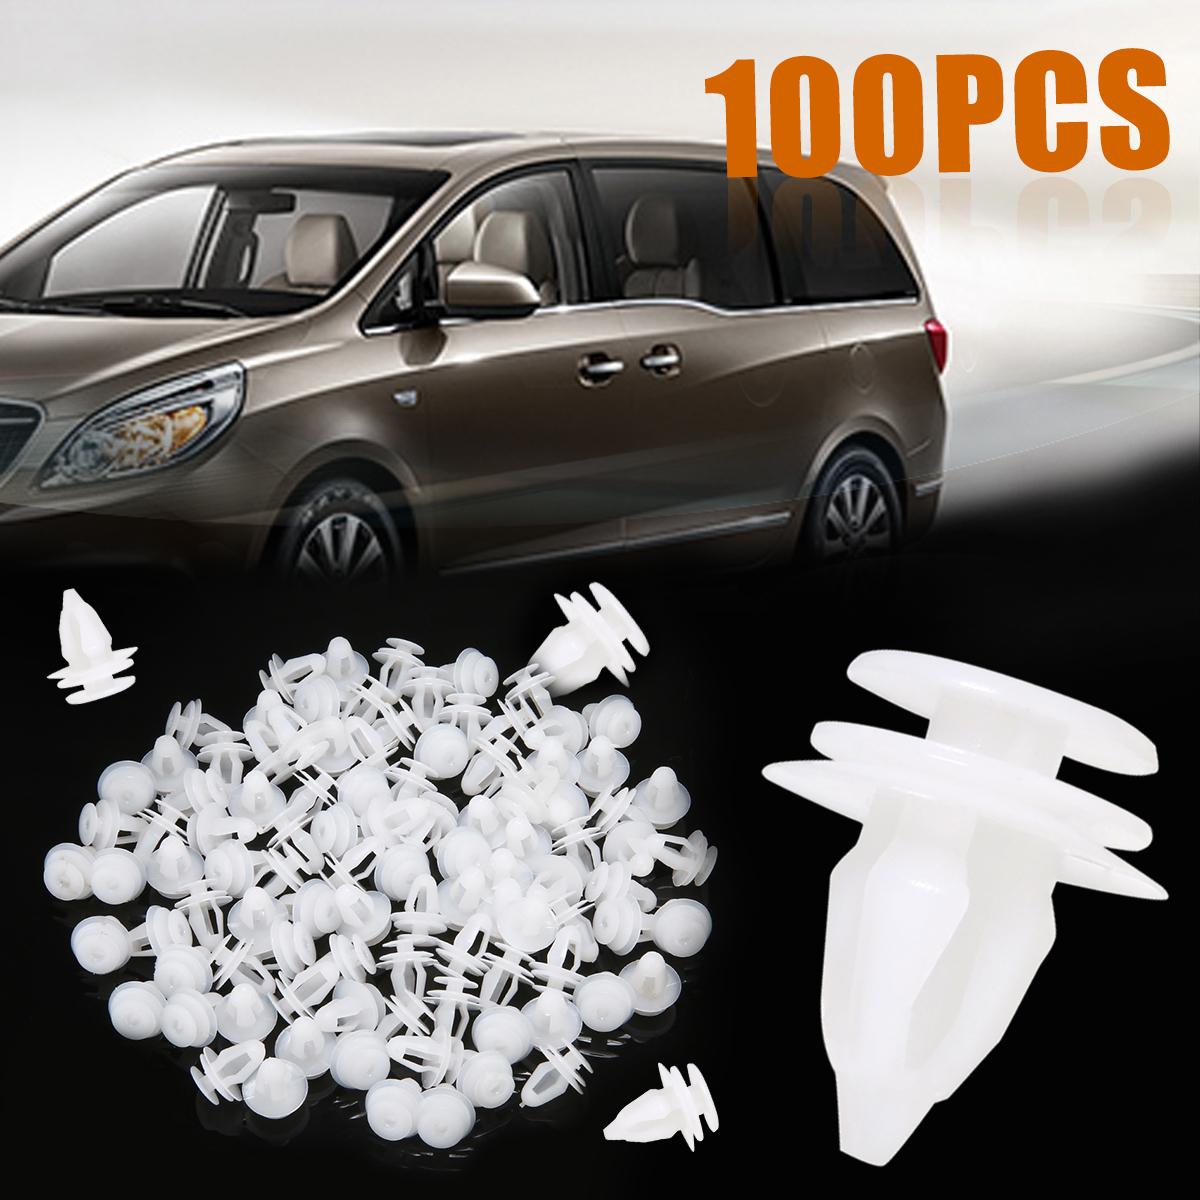 60 Interior Door Trim Plastic Panel Retainers Clips Kit Ford CAR /& VAN